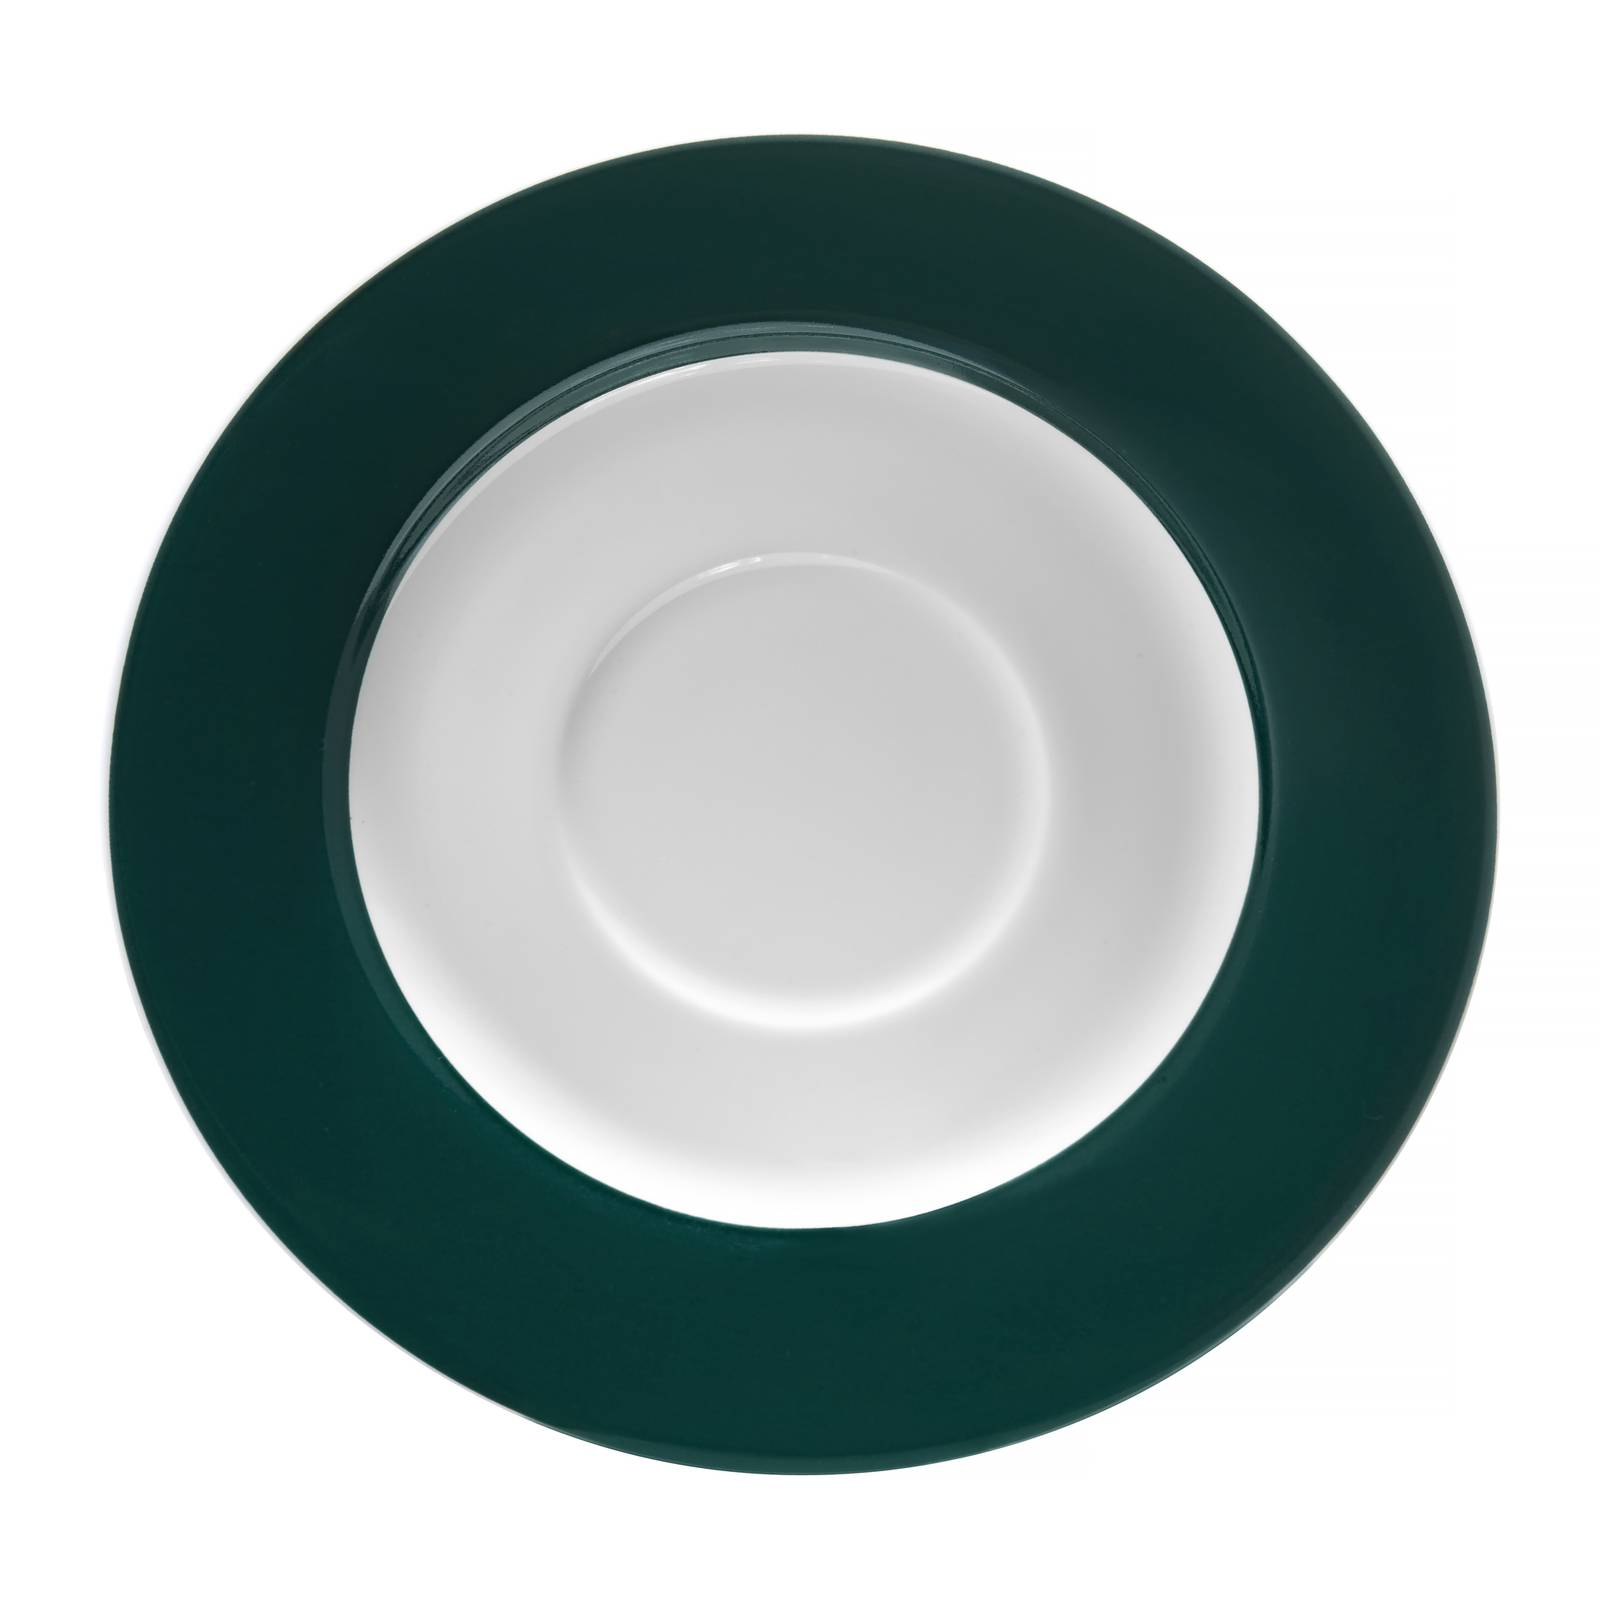 Spodek Aura Green 15,5 cm AMBITION